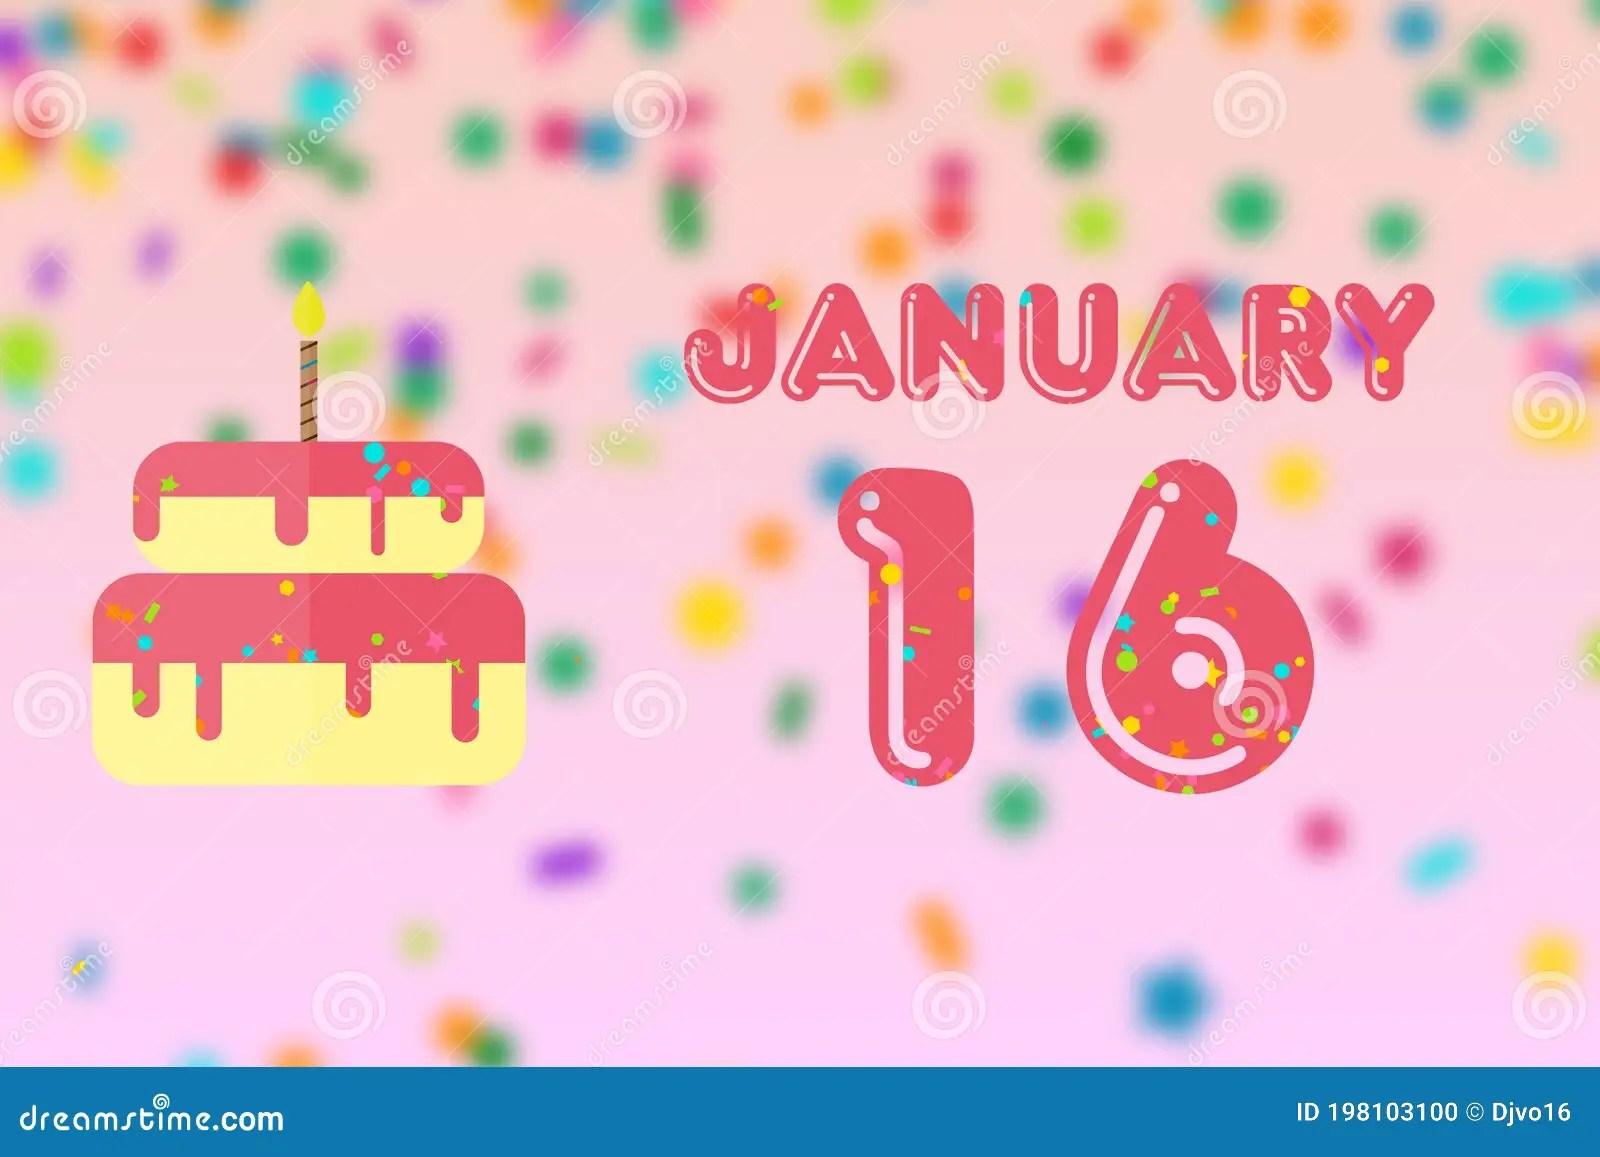 pix January Birthday Images dreamstime com